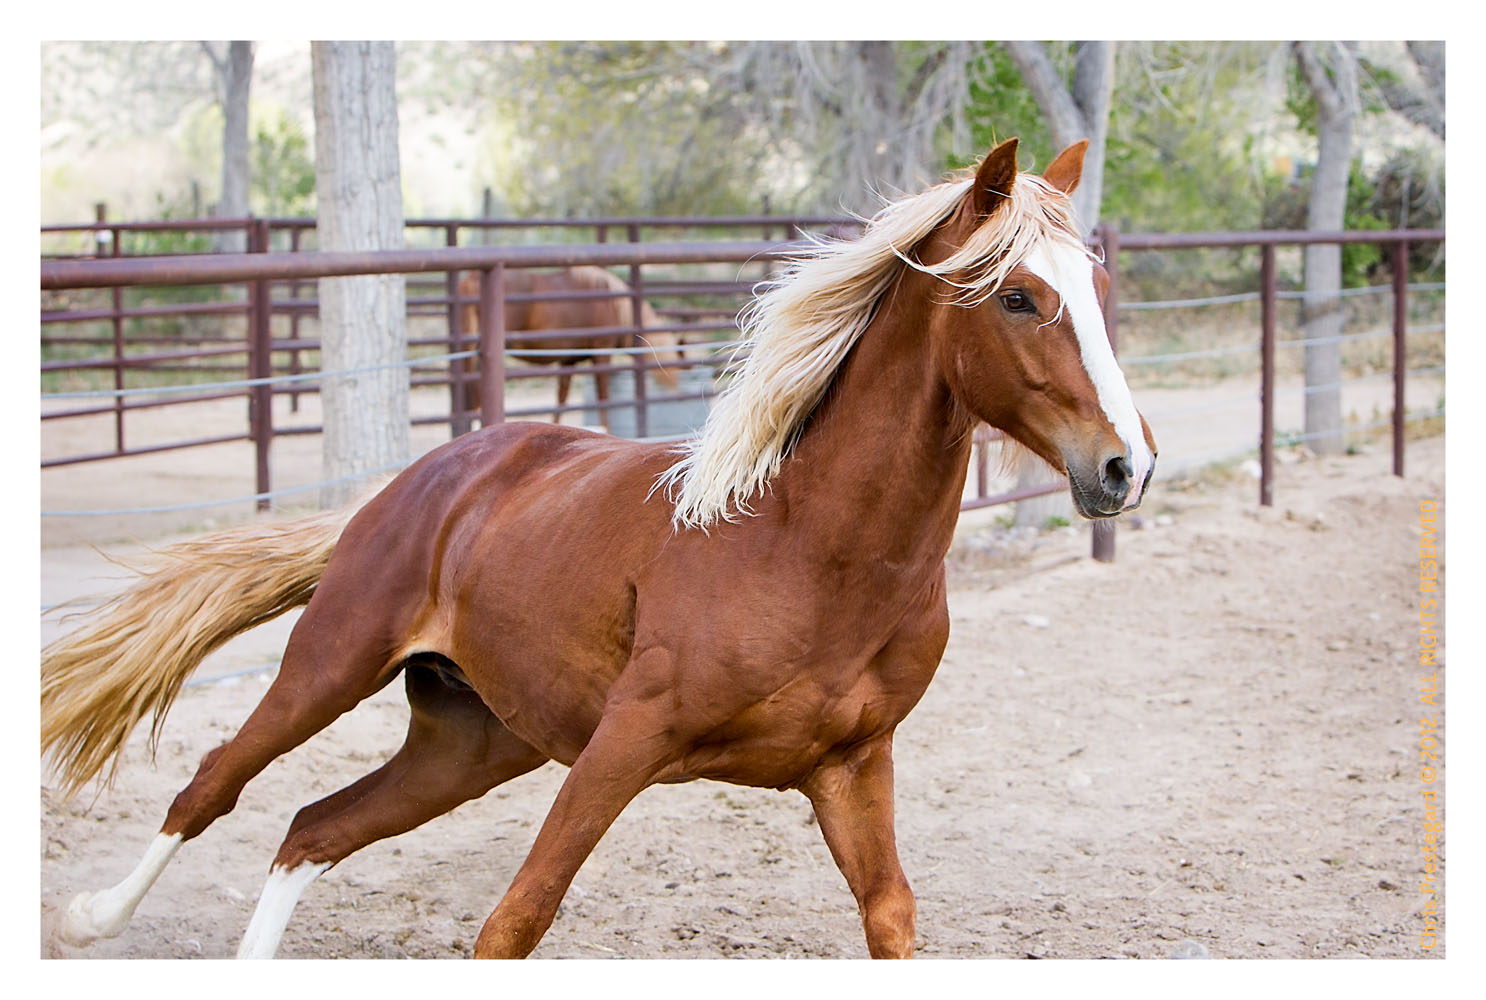 Horse2524-Feb14-2012